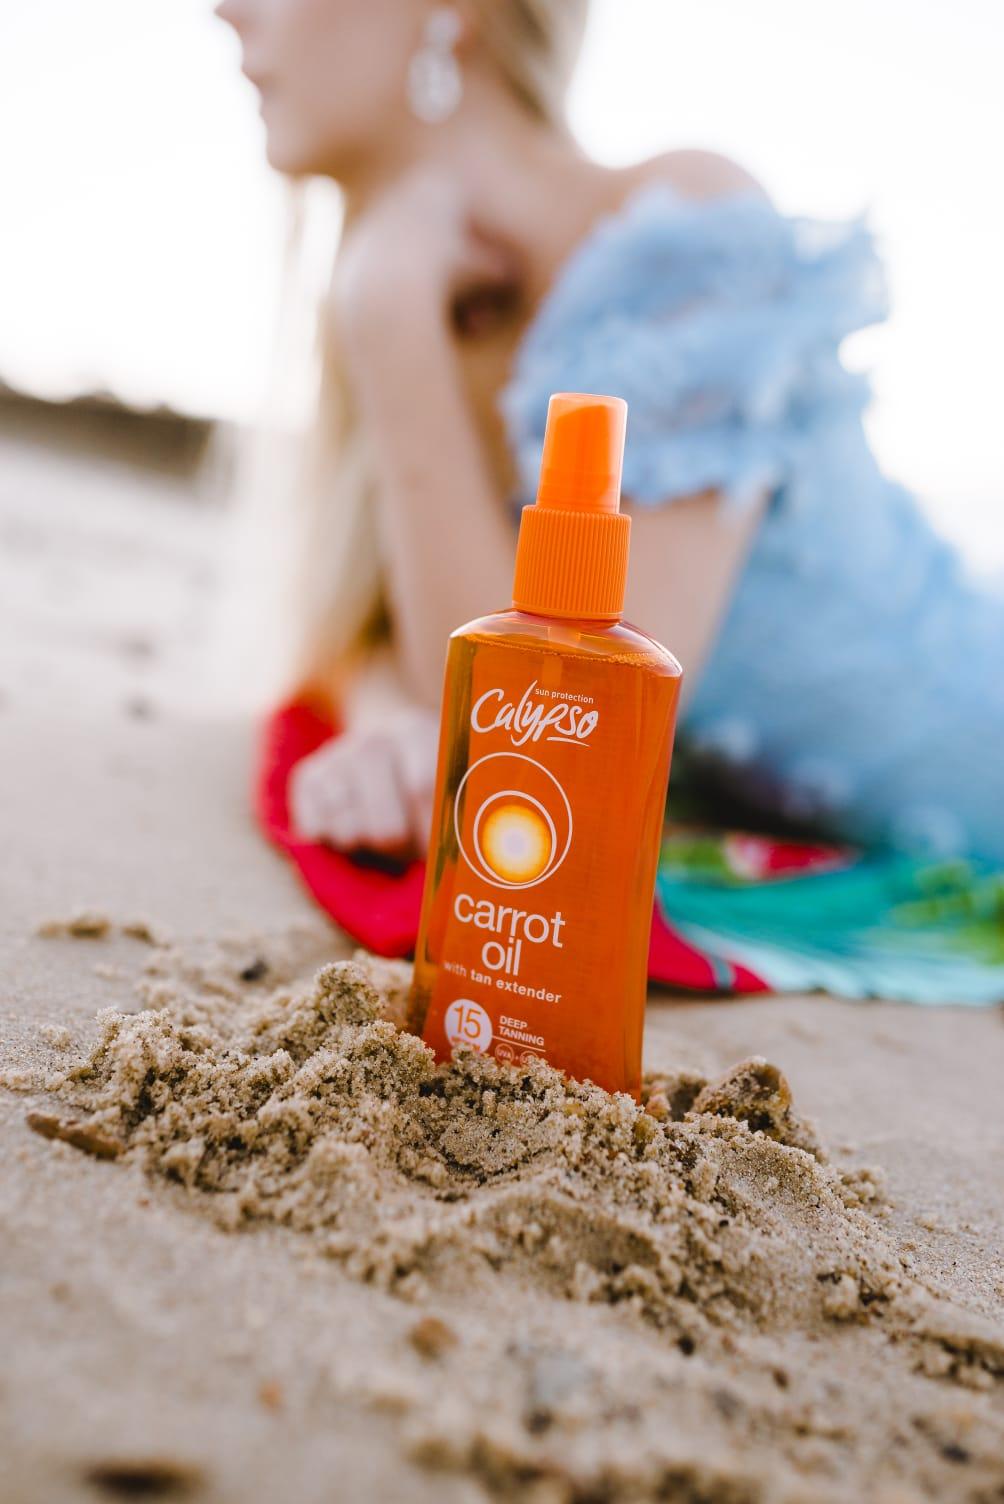 Calypso tanning carrot oil SPF 15 beach sand